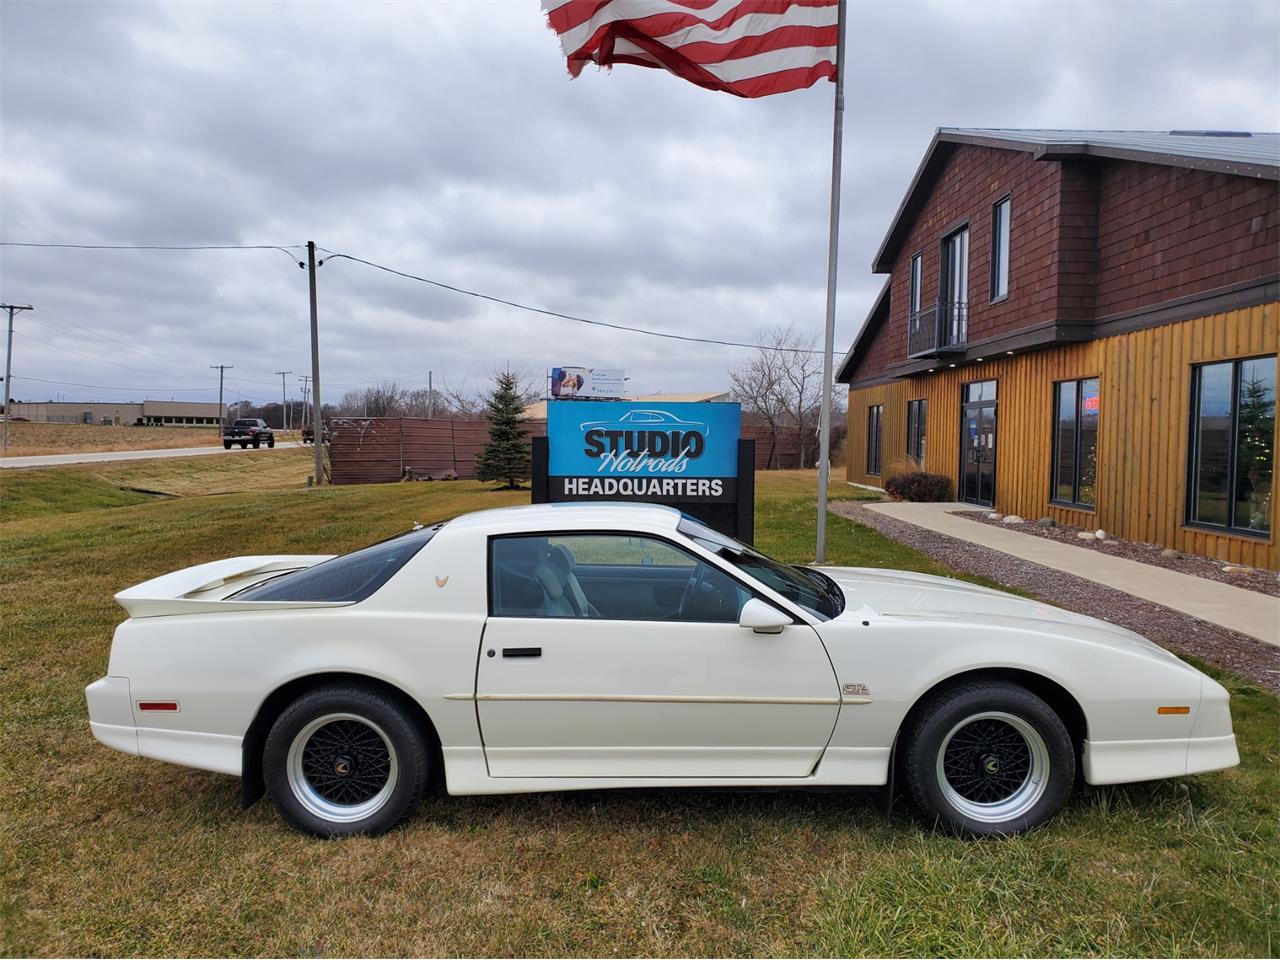 1987 Pontiac Firebird Trans Am GTA (CC-1430051) for sale in RICHMOND, Illinois